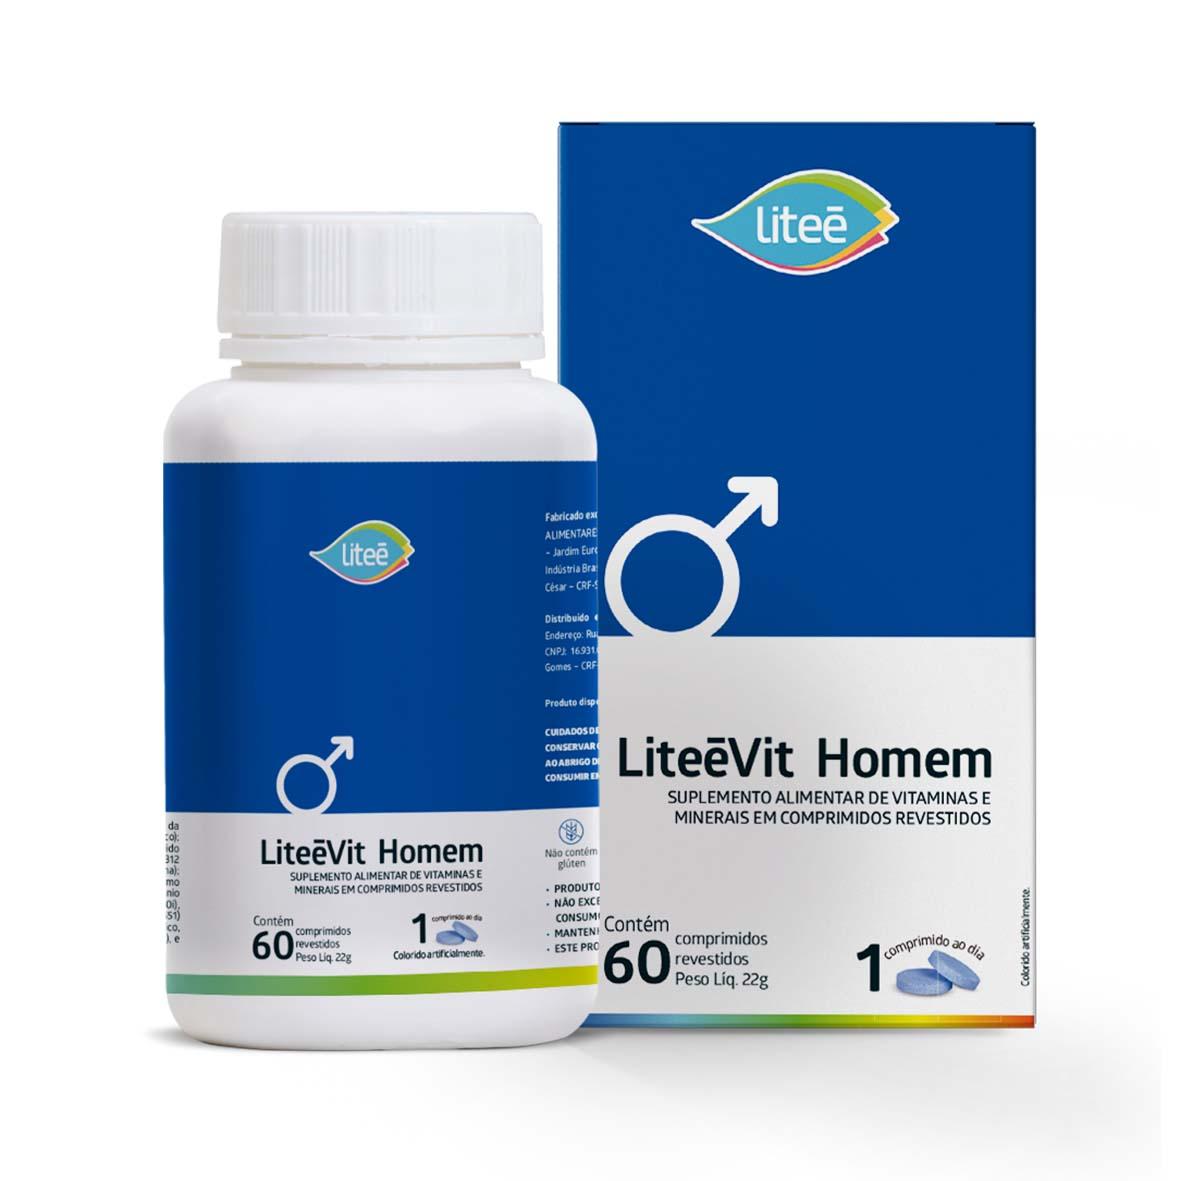 Combo Multivitamínicos LiteeVit - Imunidade para Toda Família